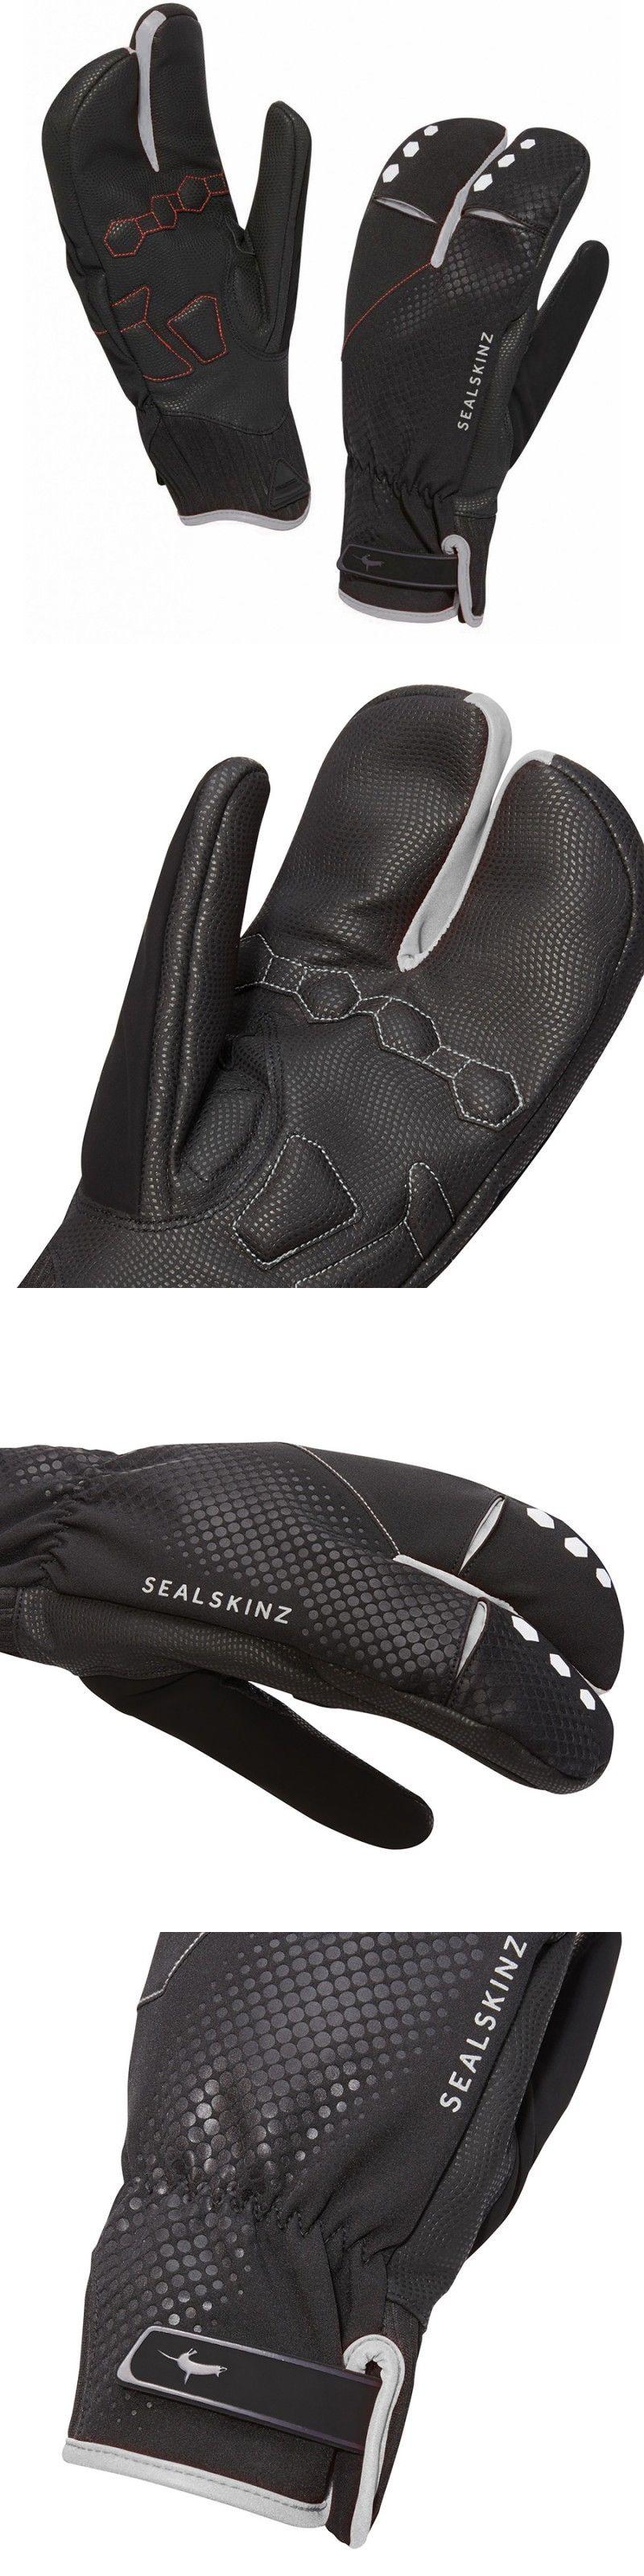 Gloves sealskinz waterproof highland xp claw lobster